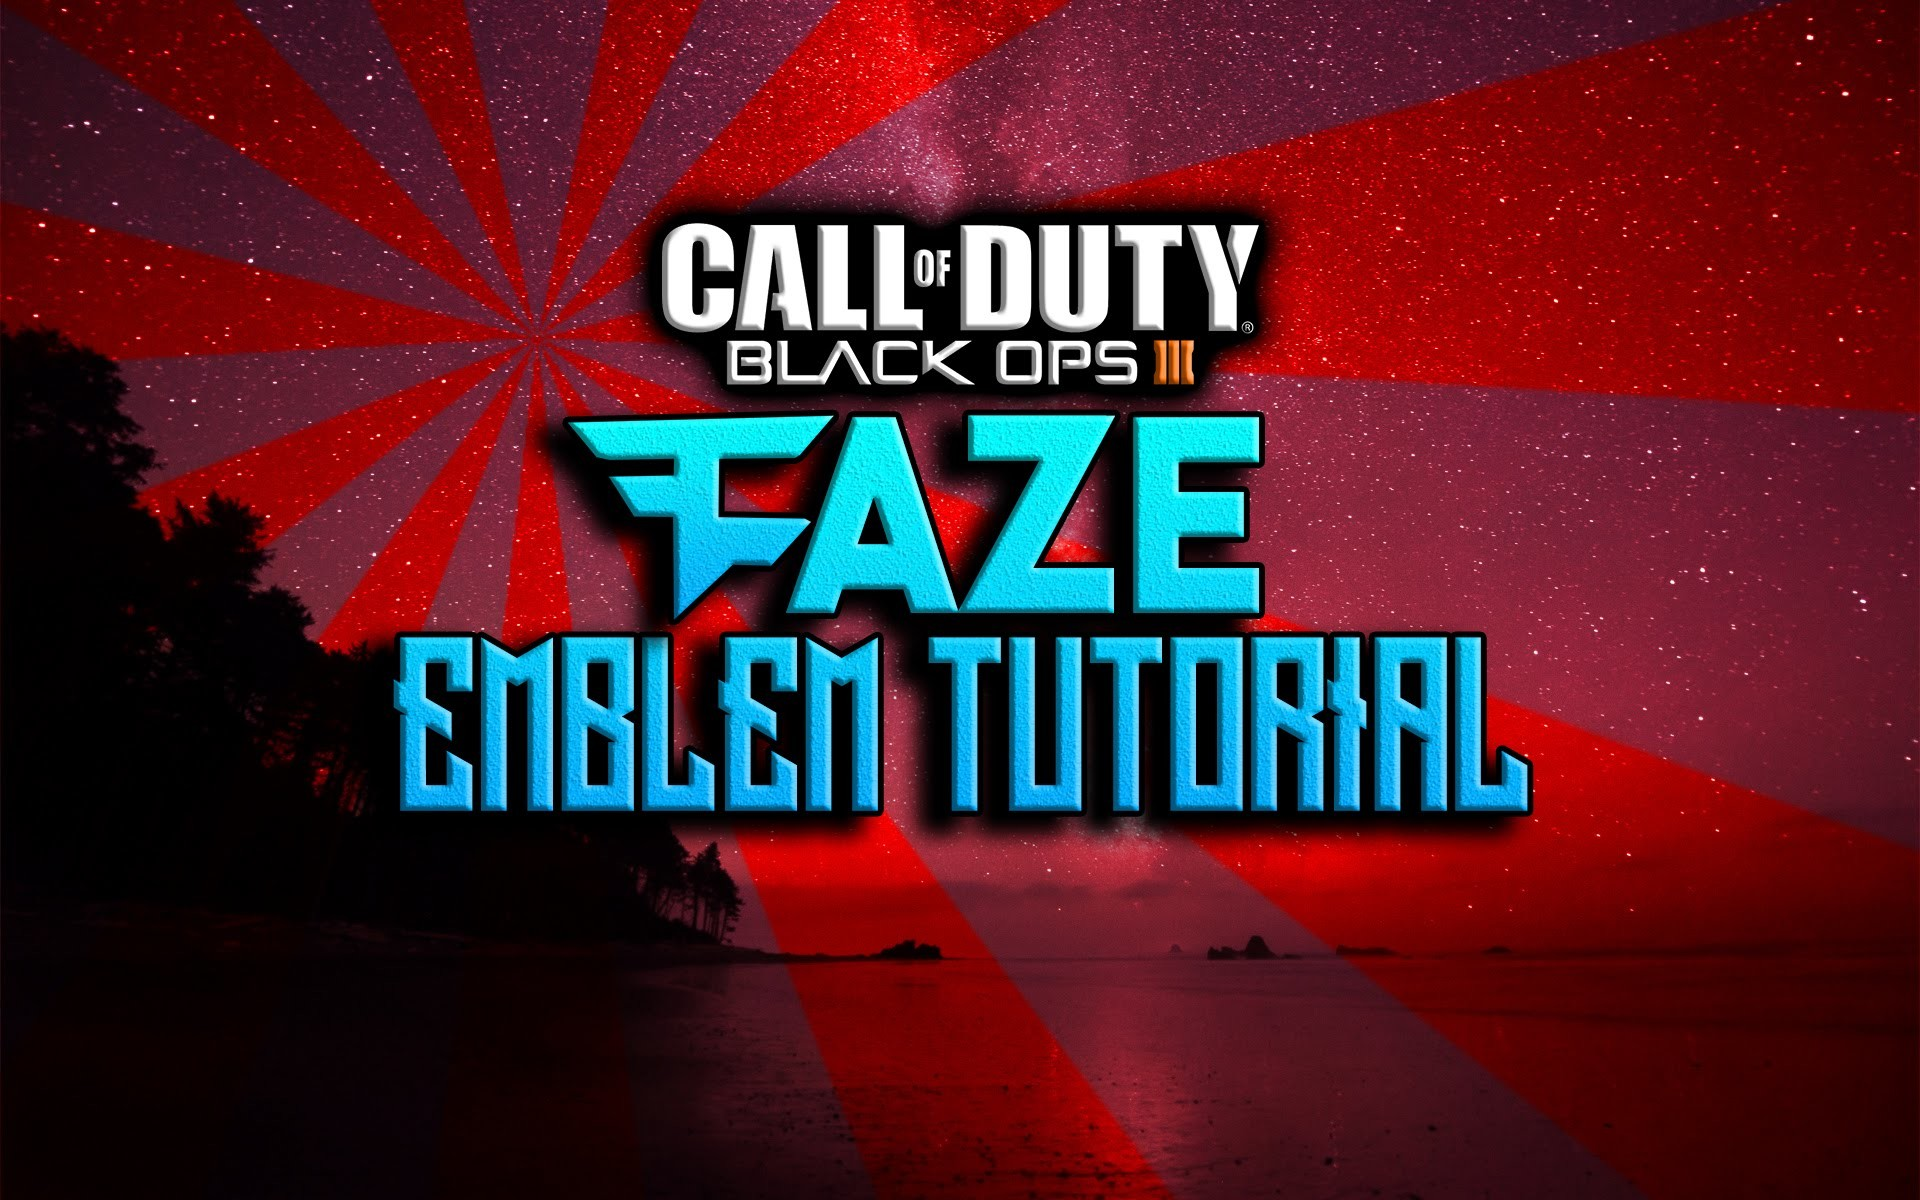 FaZe Clan Logo Emblem Tutorial: COD Black Ops 3 Emblem Tutorial! FaZe  Emblem Bo3. – YouTube